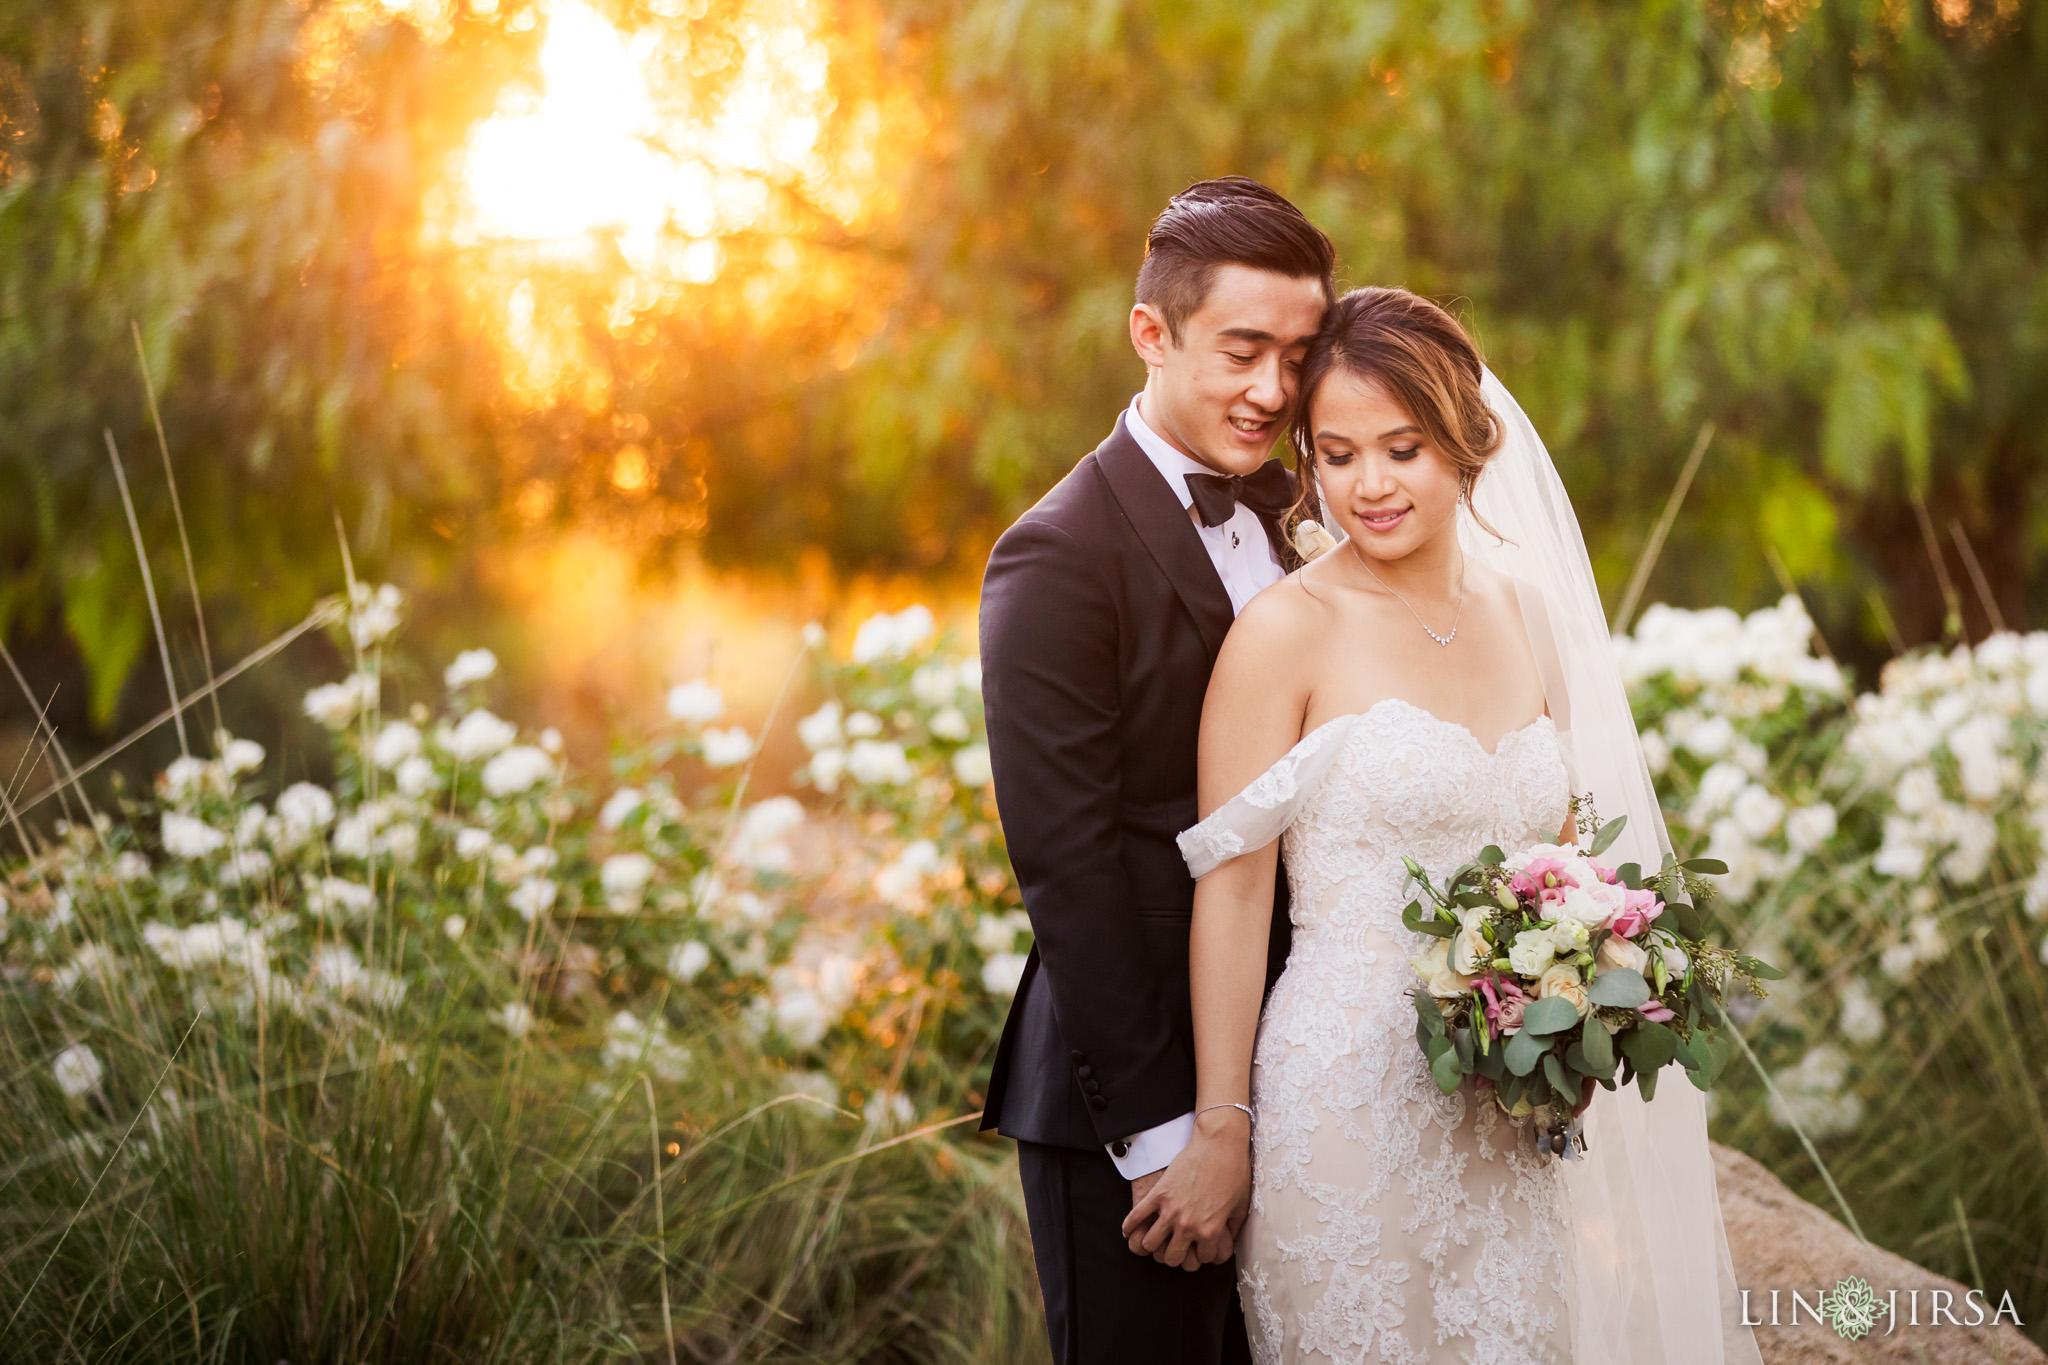 Wedding Photography   Portrait Photography Sydney